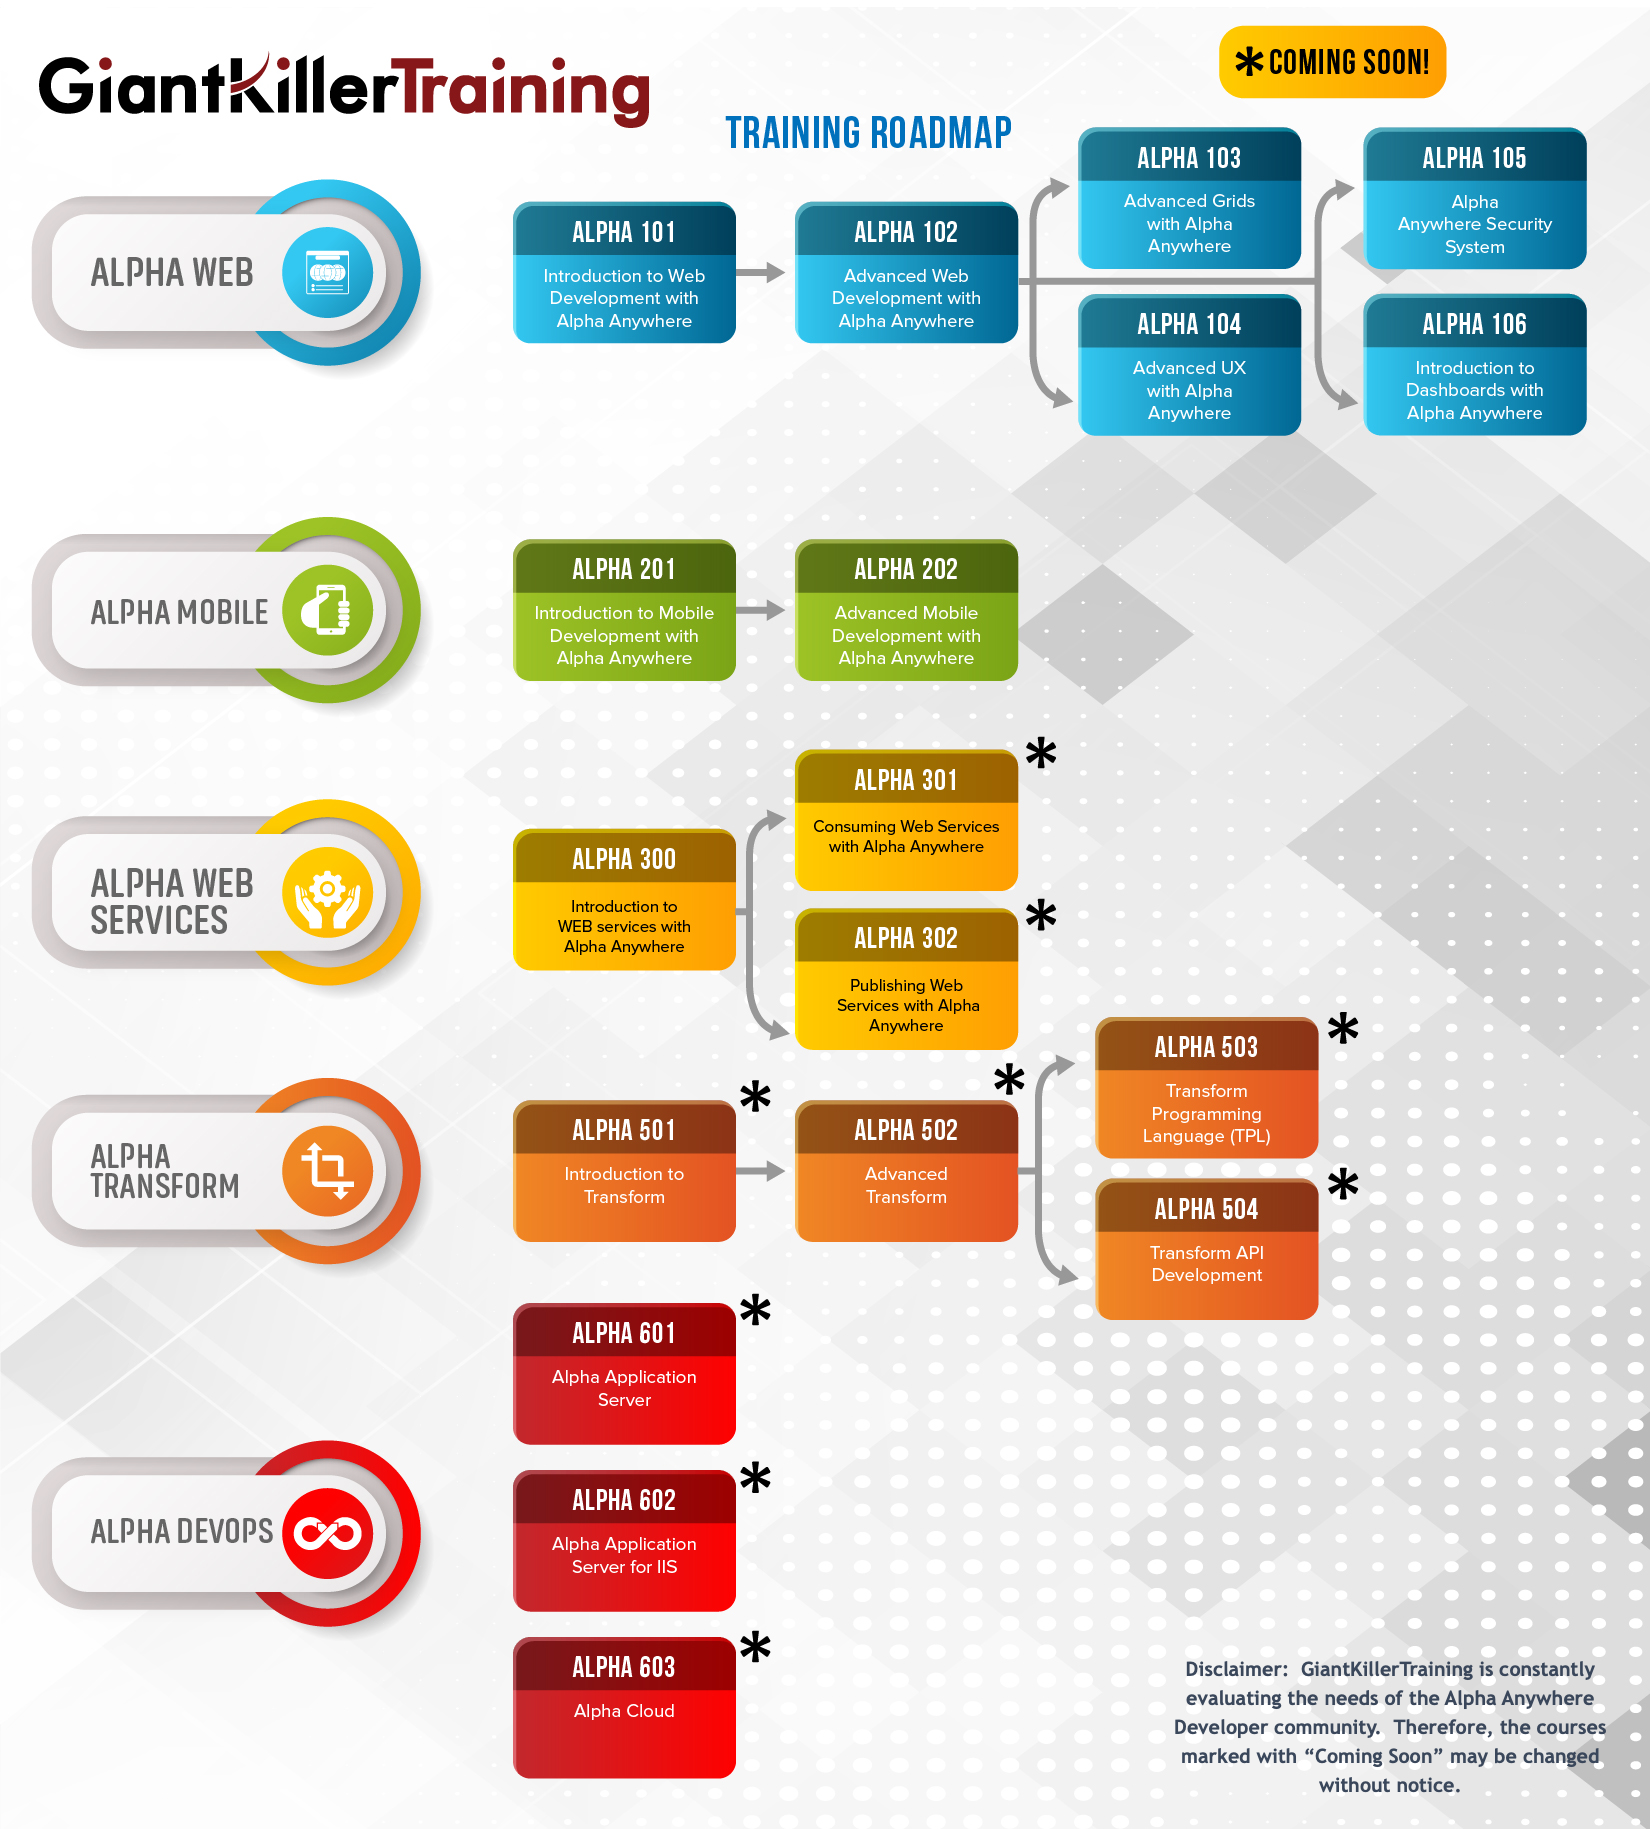 GiantKillerTraining Roadmap highres